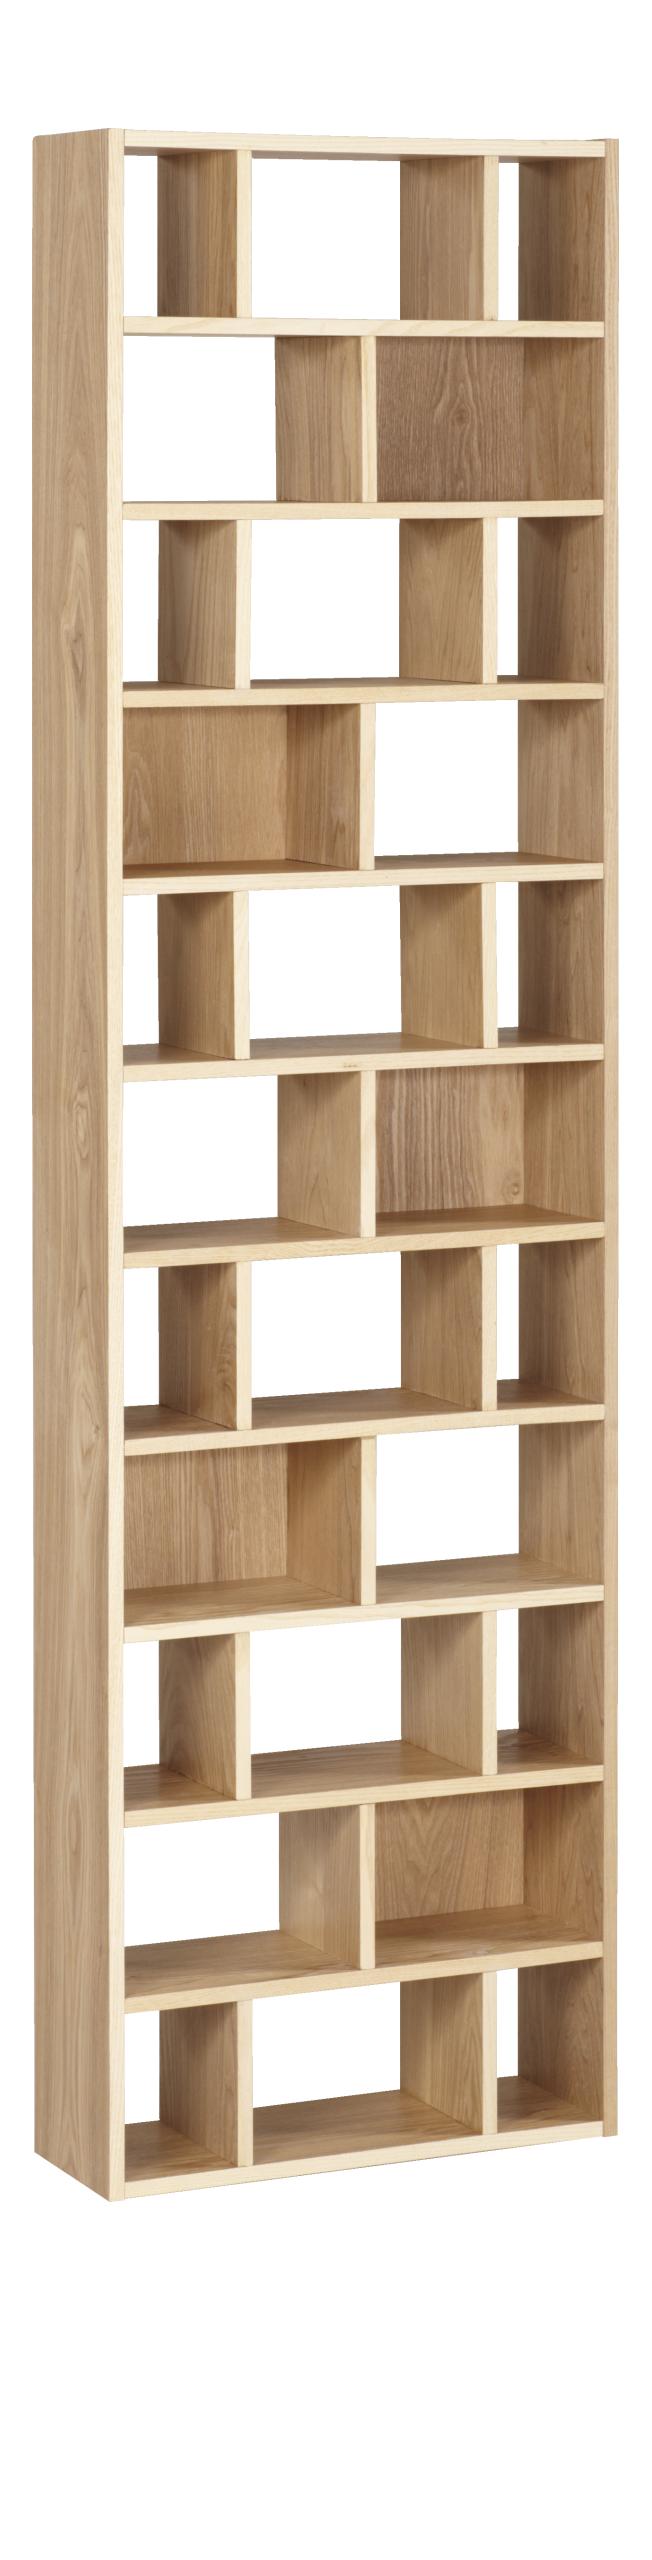 cleo cd and dvd rack natural wood muebles para pelis y. Black Bedroom Furniture Sets. Home Design Ideas